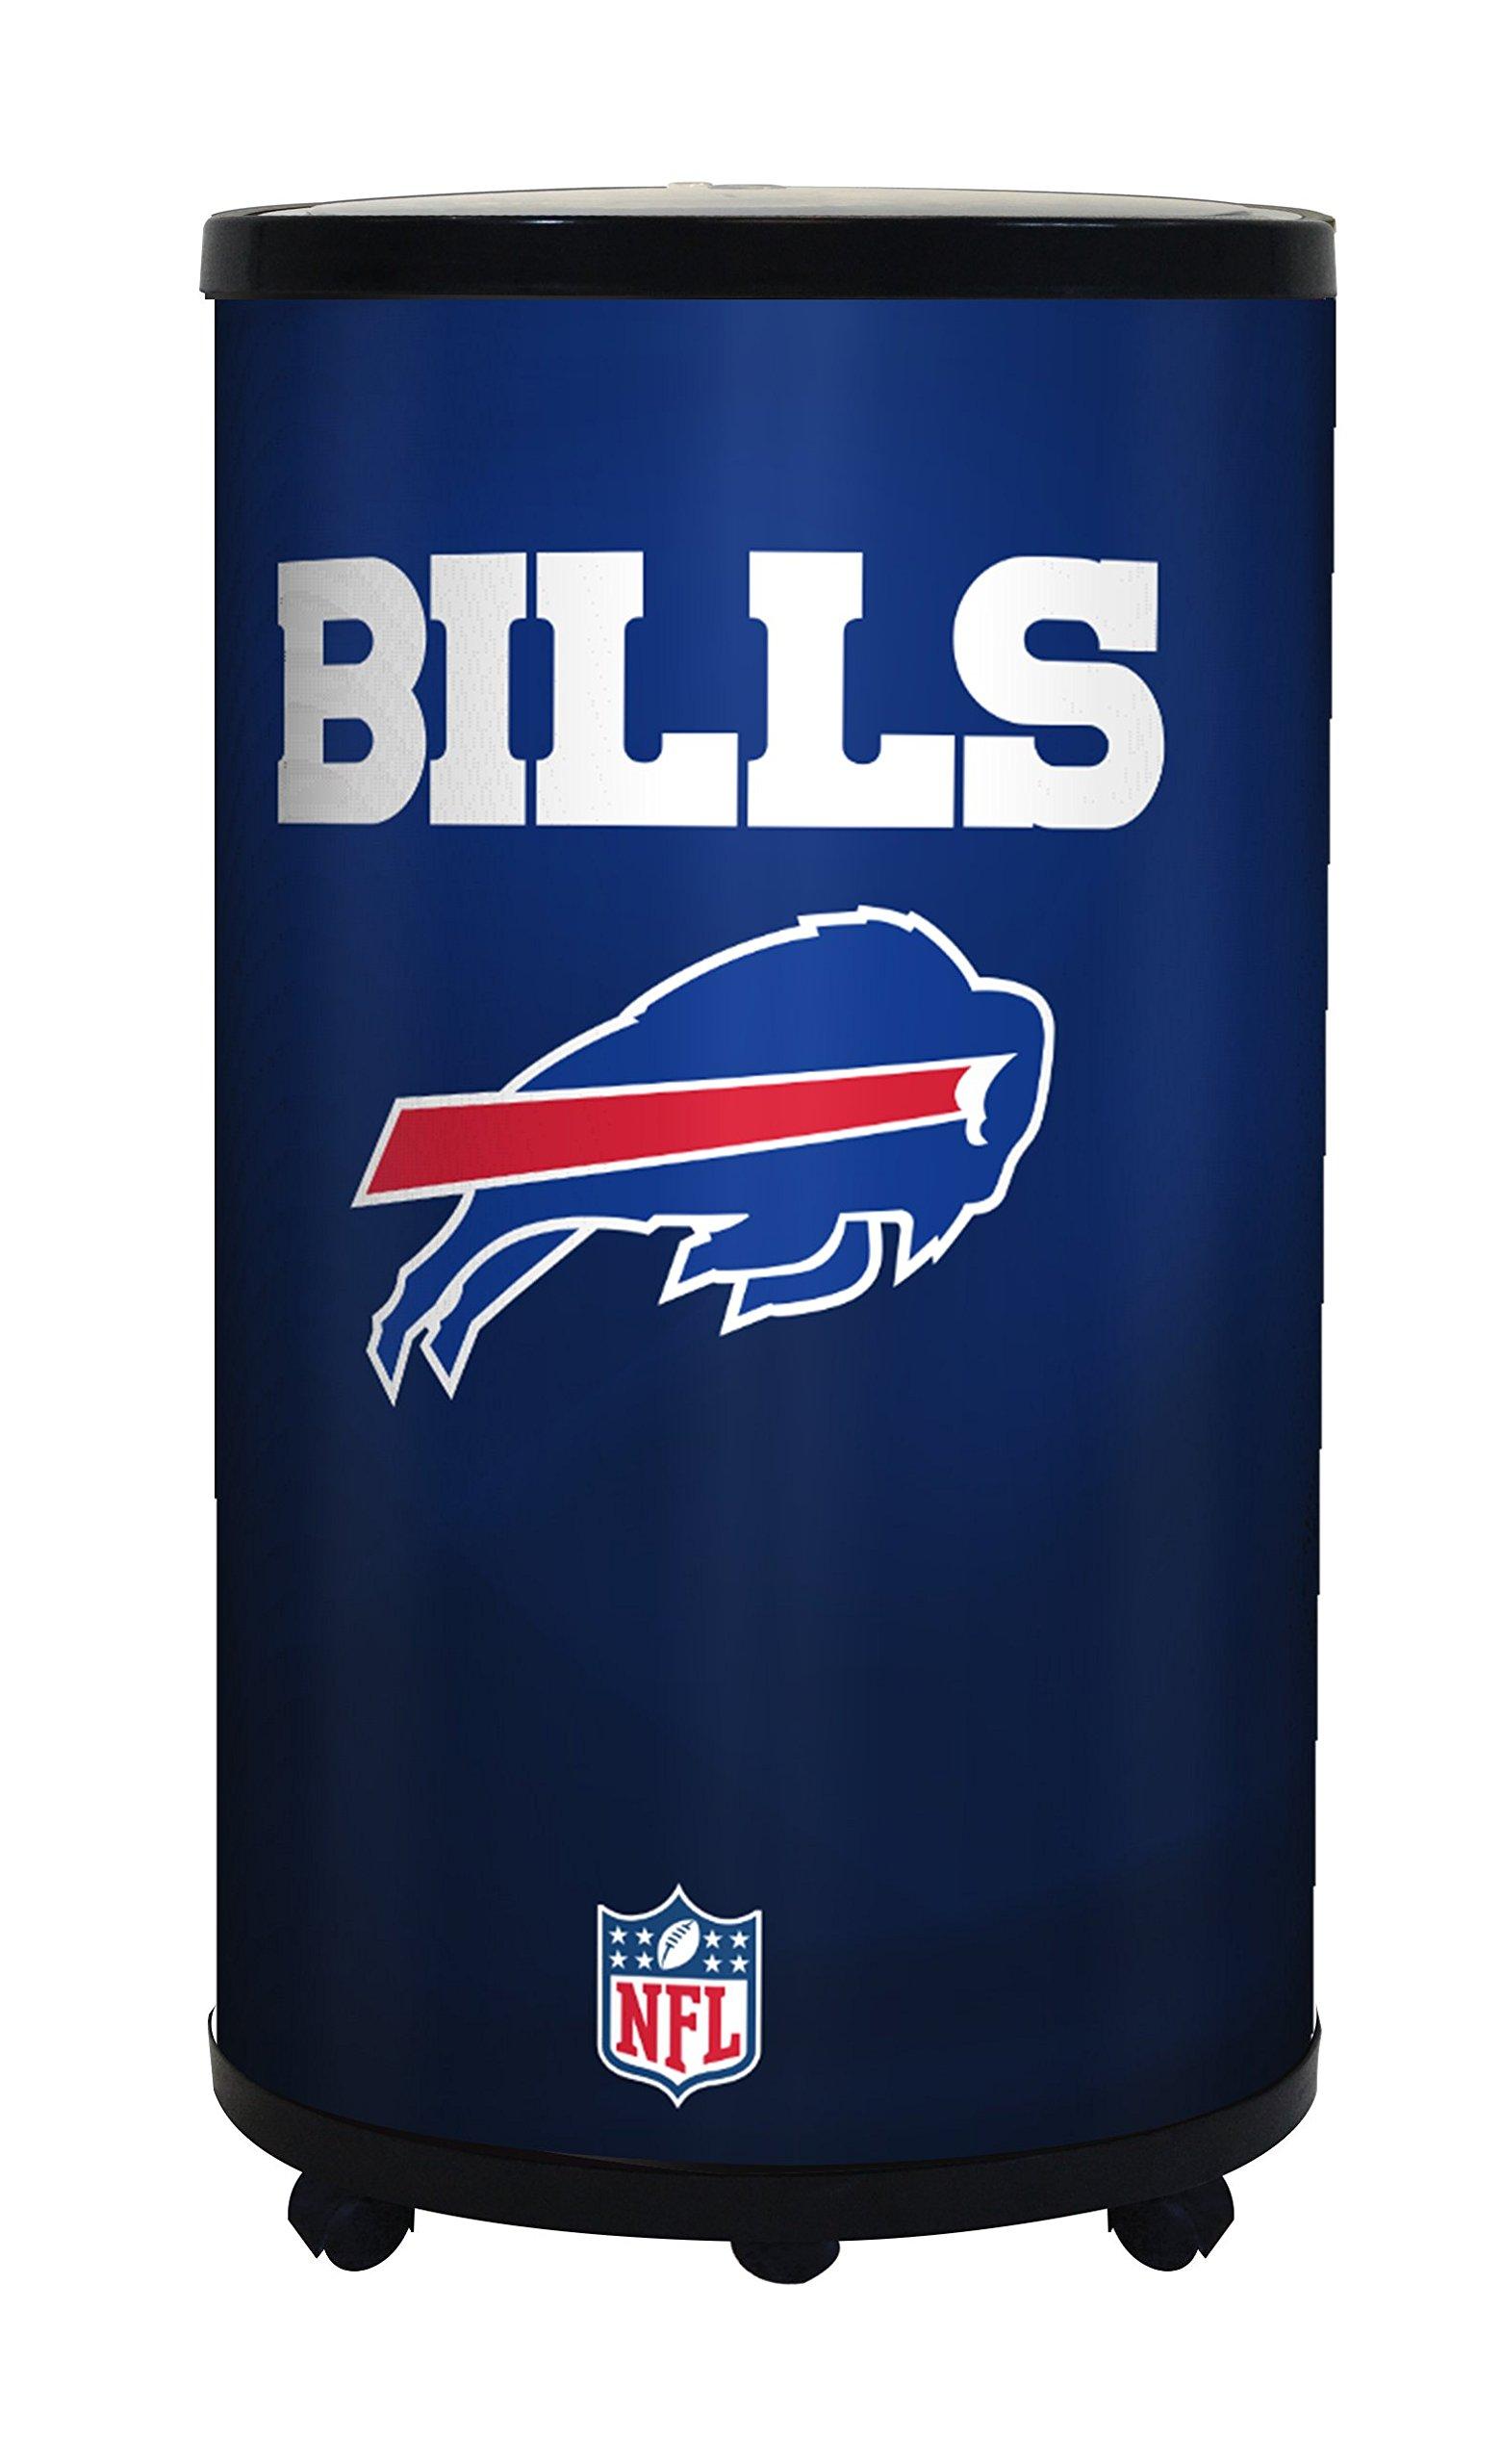 NFL Buffalo Bills Ice Barrel Cooler, Black, 19''